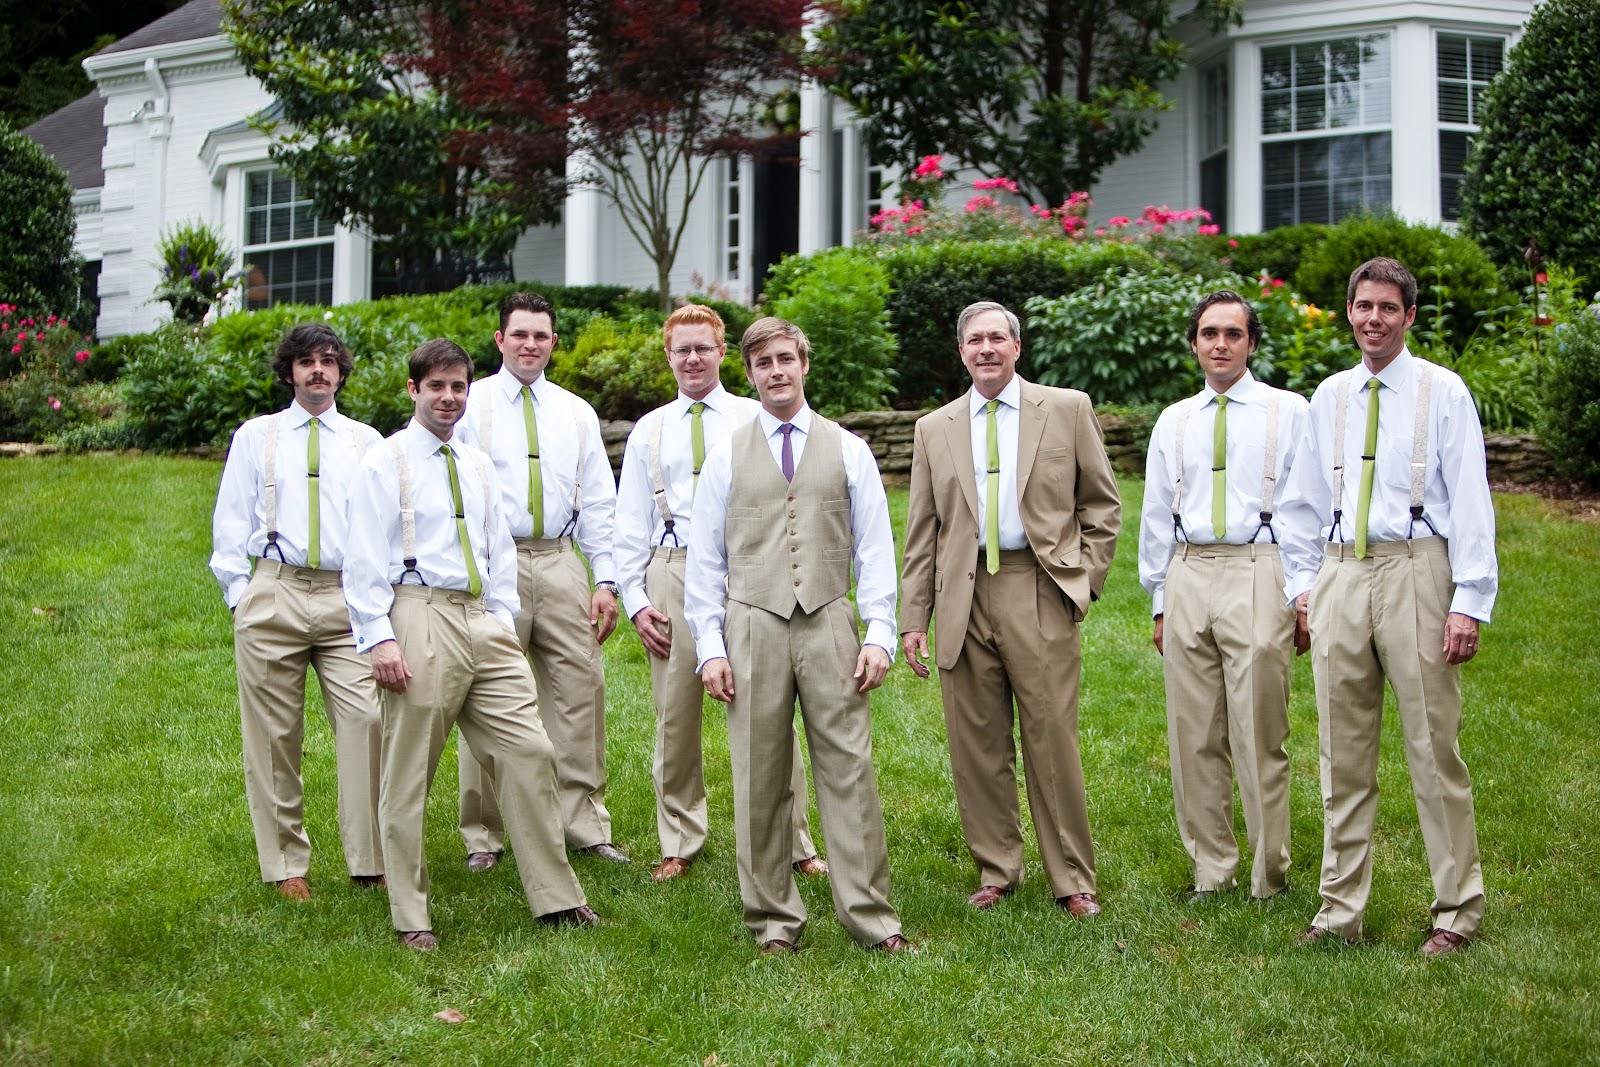 The Bridal Times: April 2012